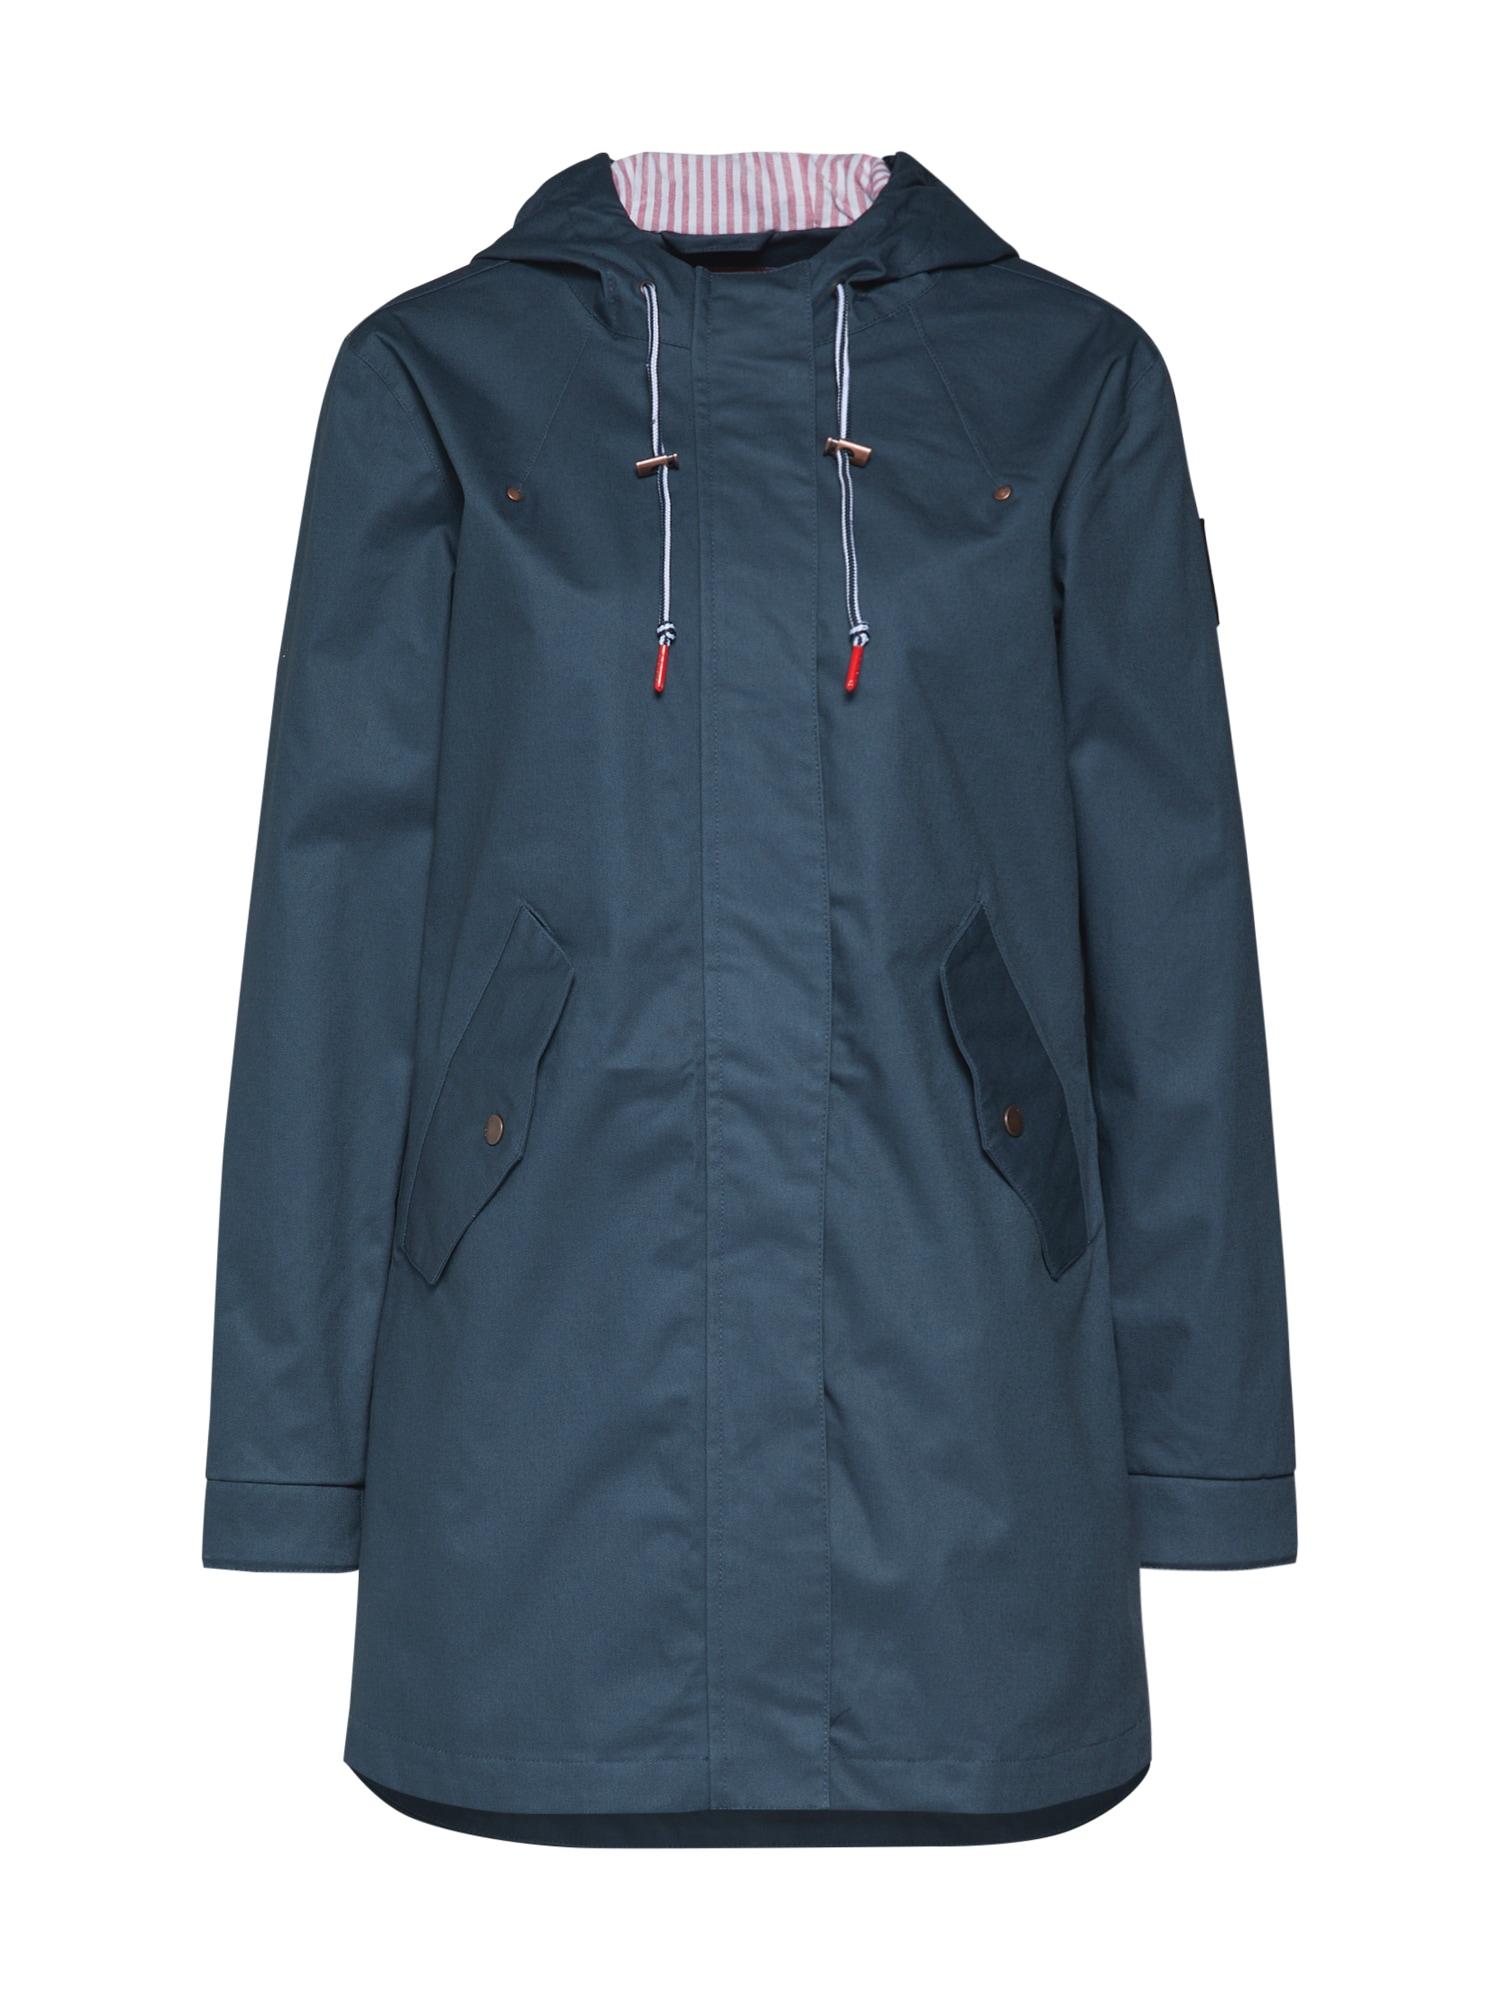 Derbe Rudeninis-žieminis paltas 'Summer VILLE' tamsiai mėlyna